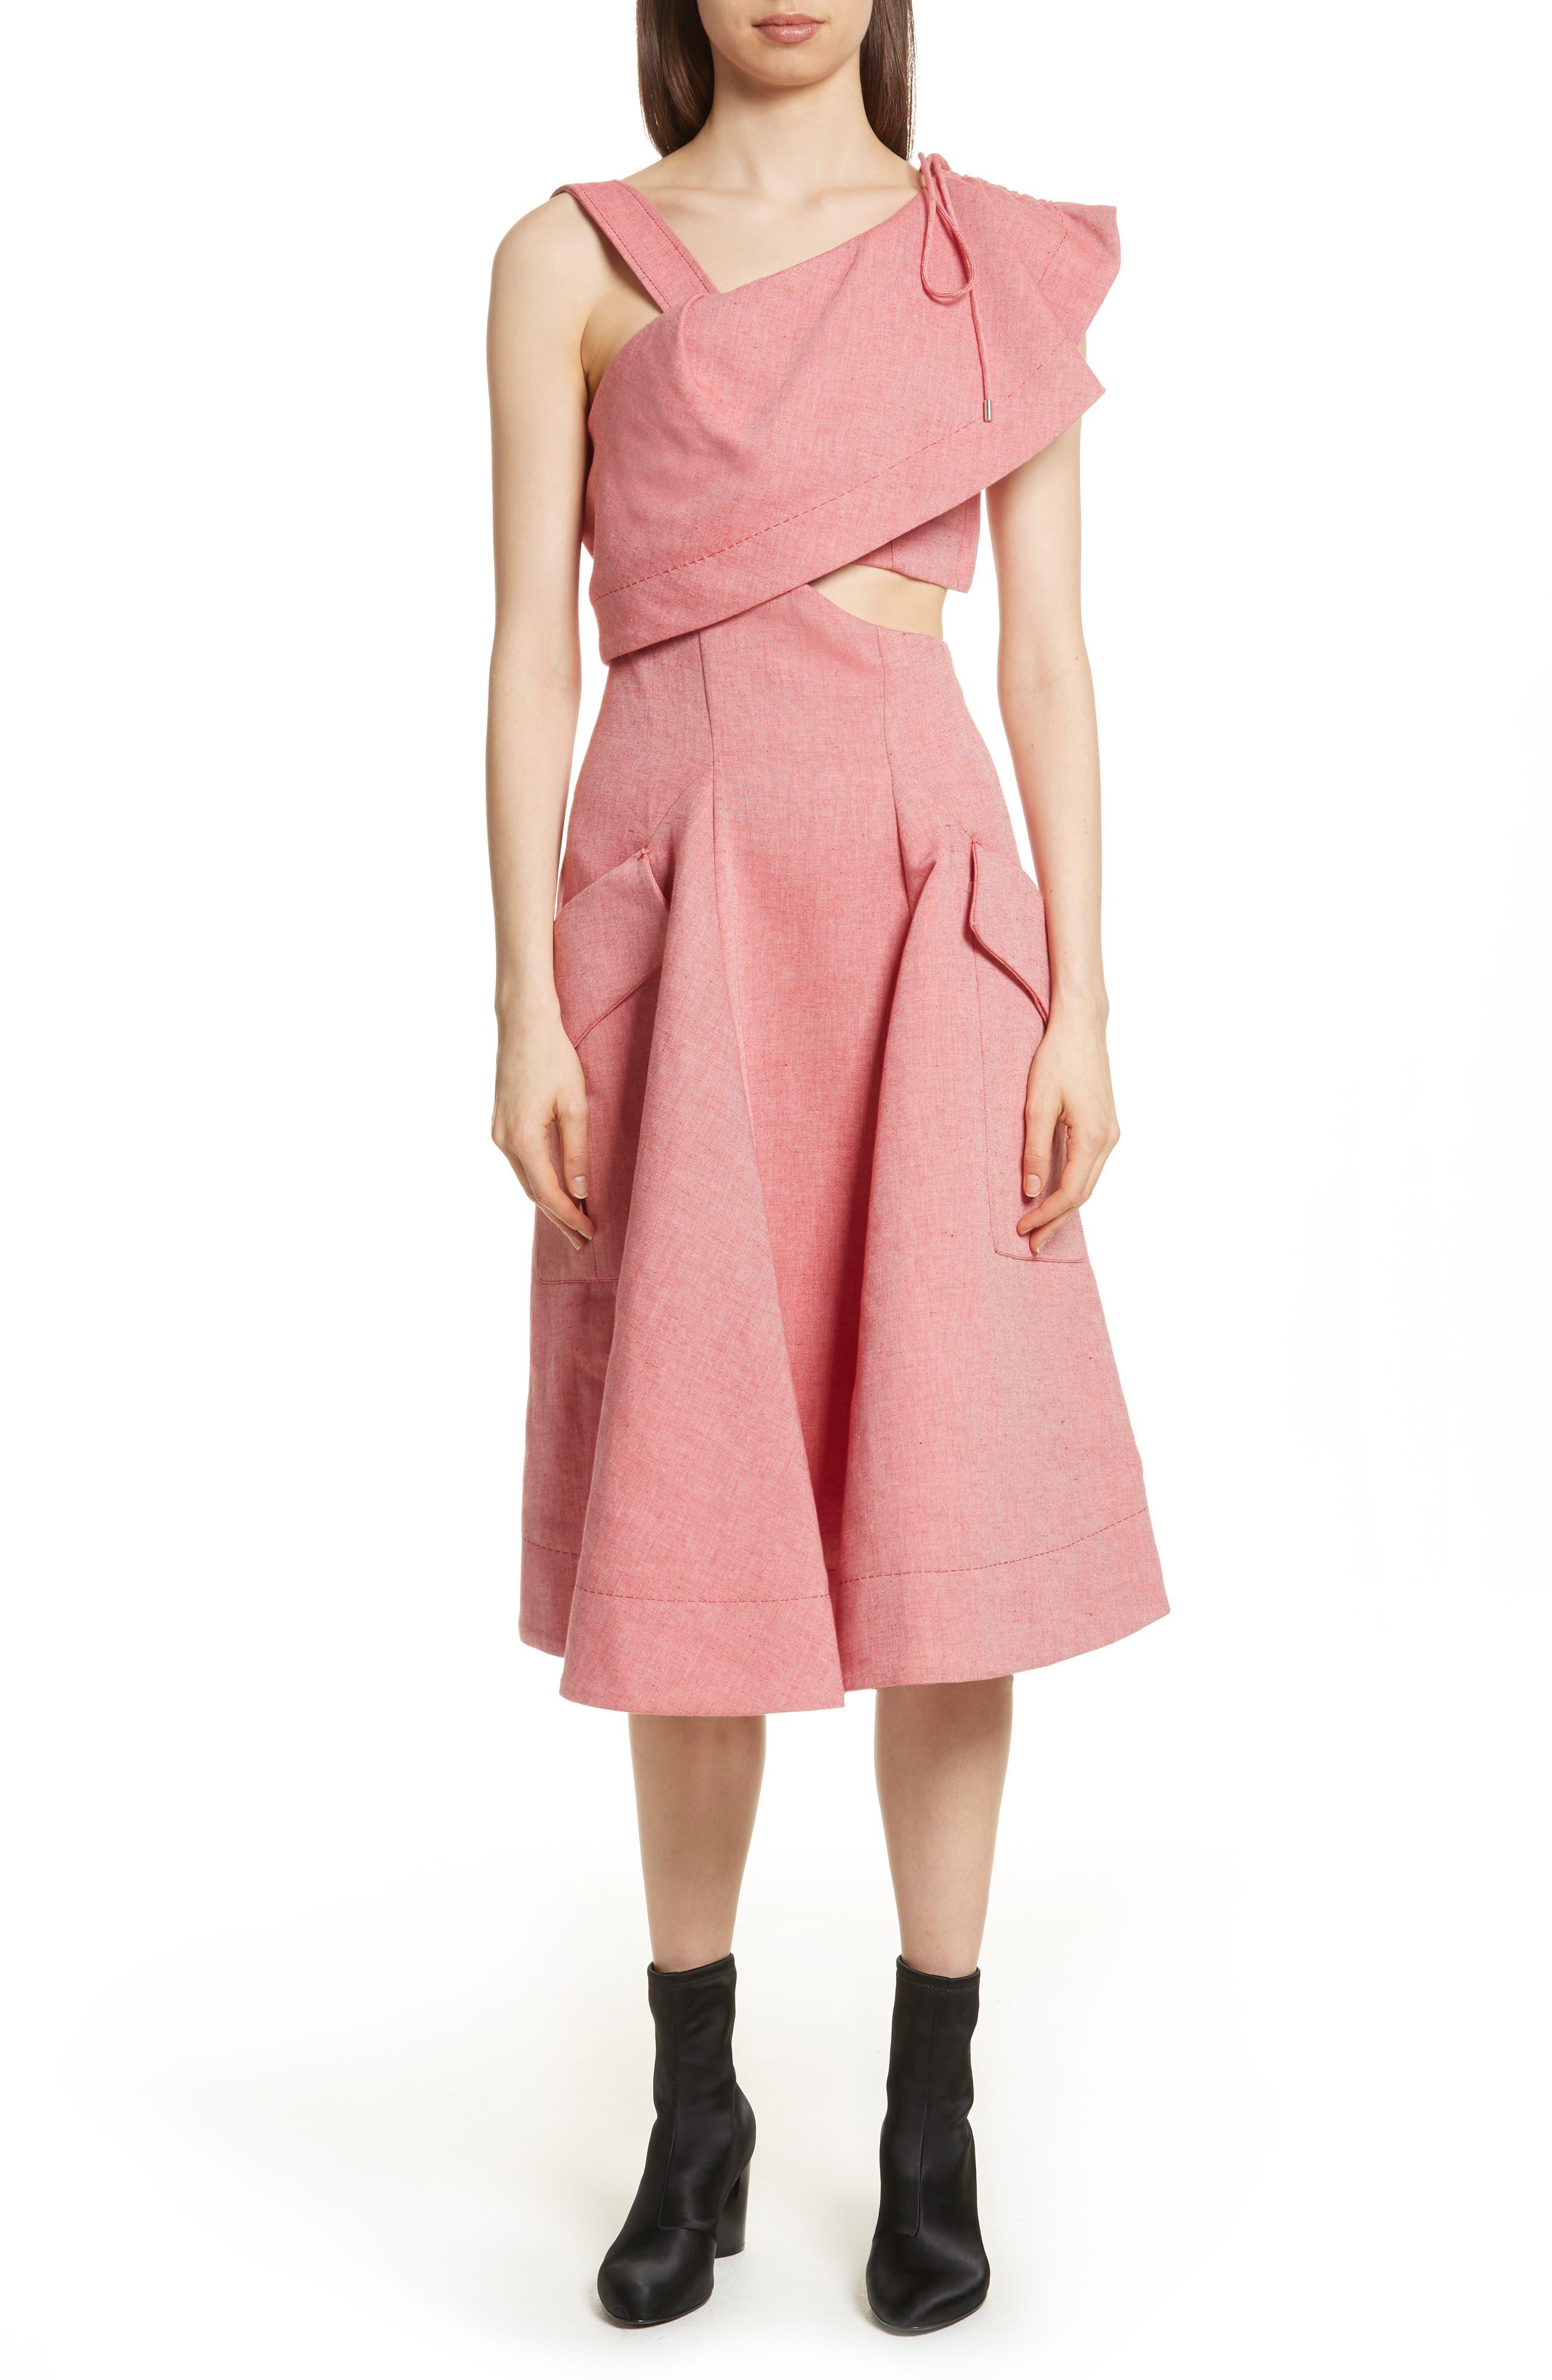 Robe Genou Dress,                             Main thumbnail 1, color,                             650